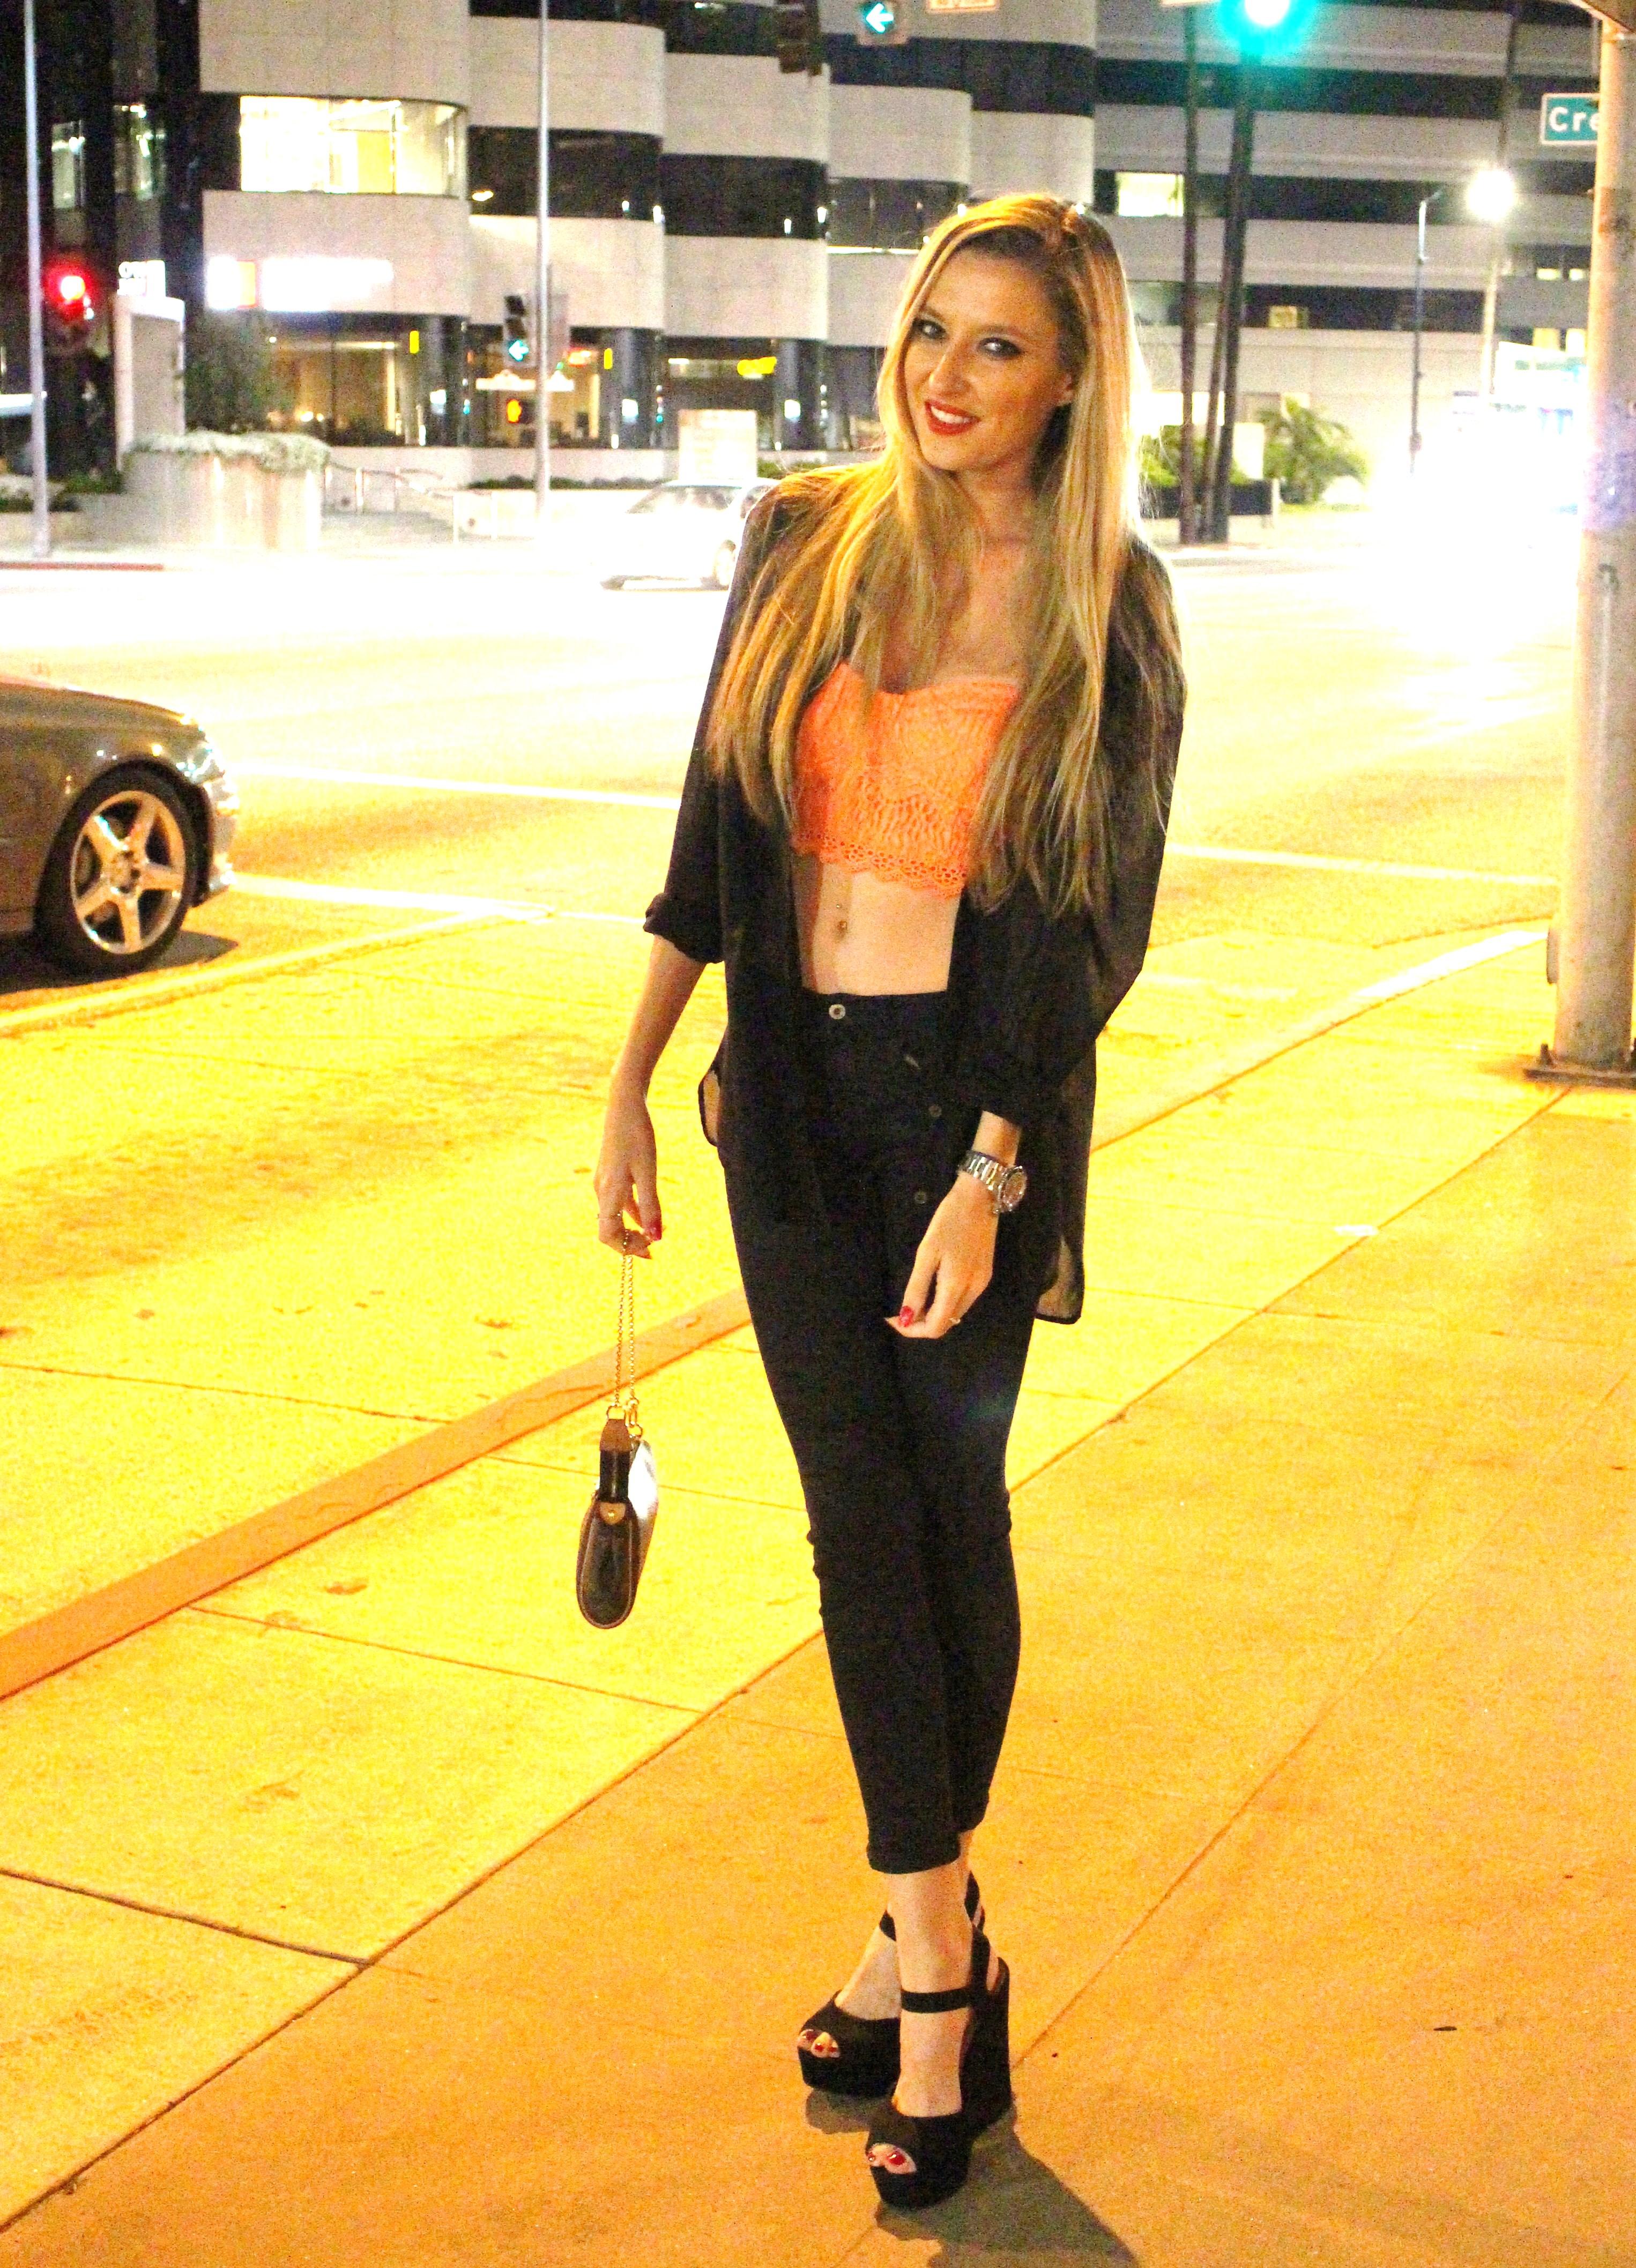 Black_Coral_Lights_Los_Angeles_Louis_Vuitton_Lara_Martin_Gilarranz_Bymyheels (8)